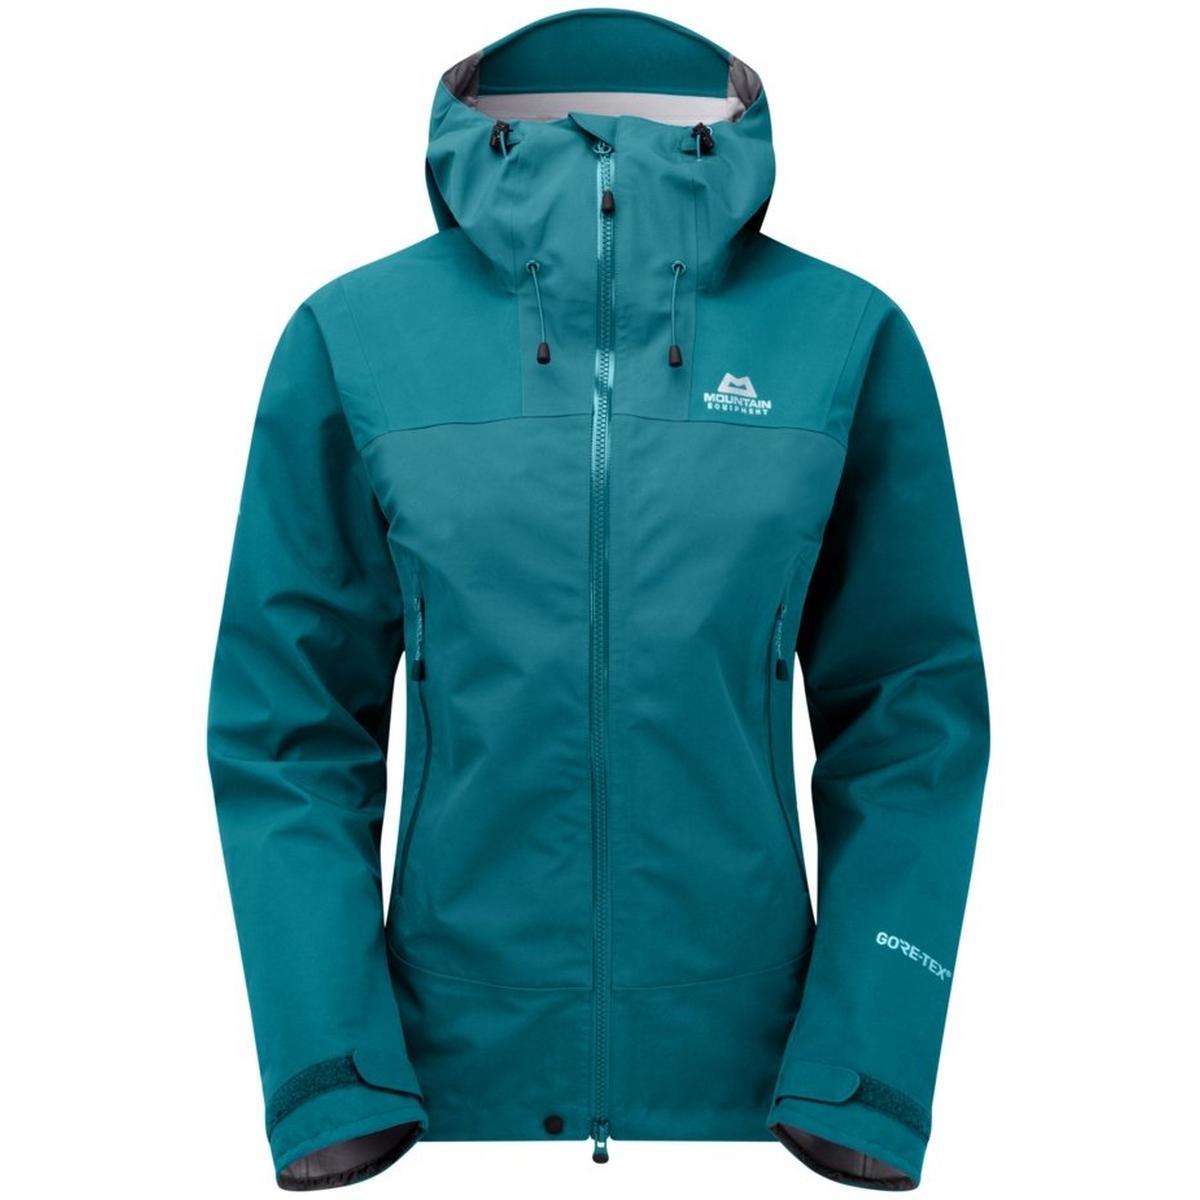 Mountain Equipment Women's Rupal Jacket - Legoin Blue